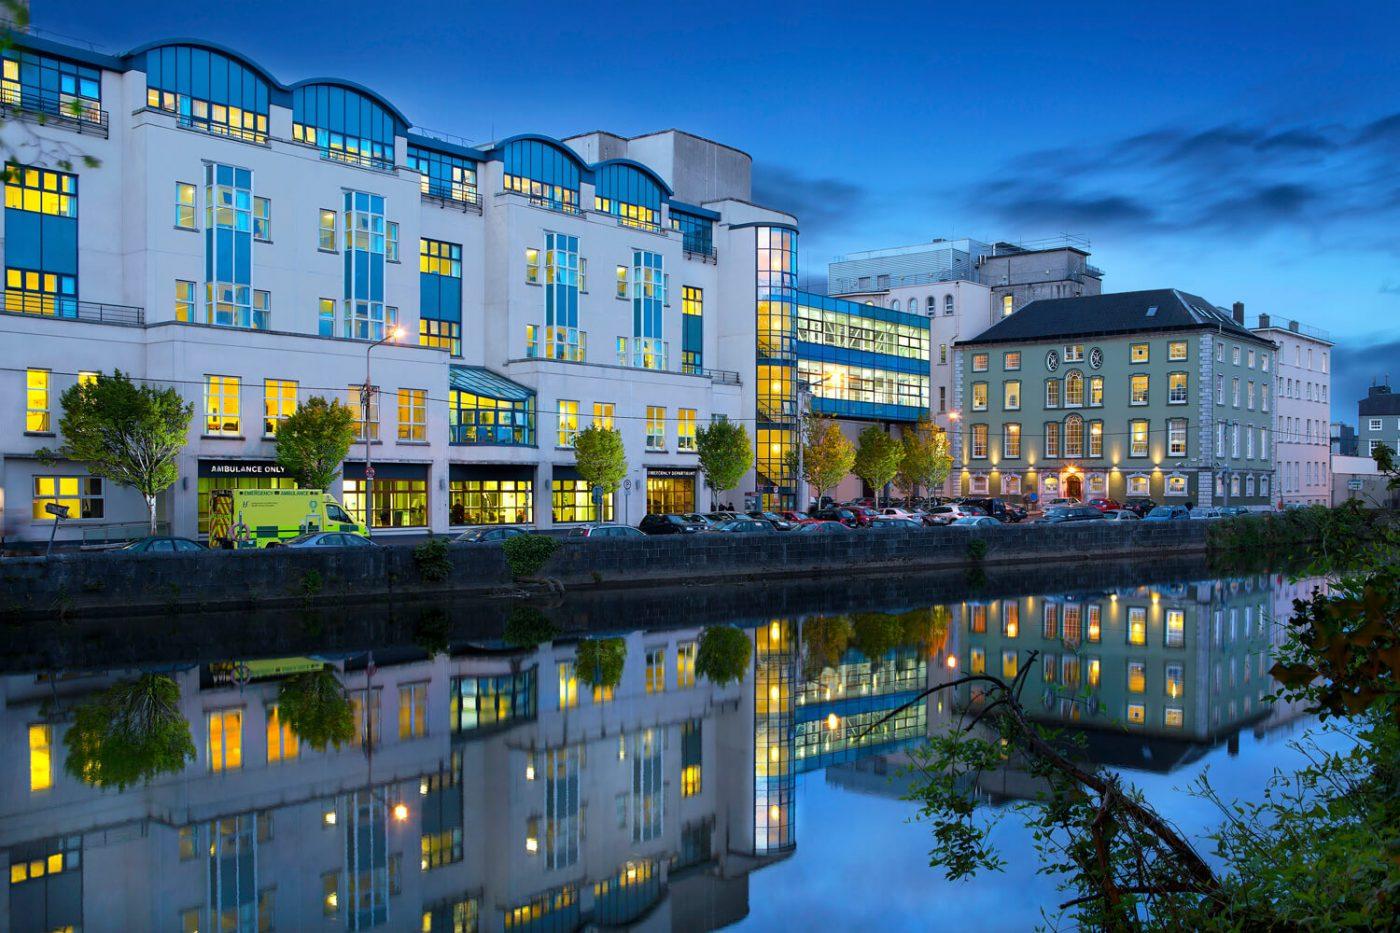 Jim McCarthy Photographer Cork - Photography Prints - Mercy University Hospital Cork #3375